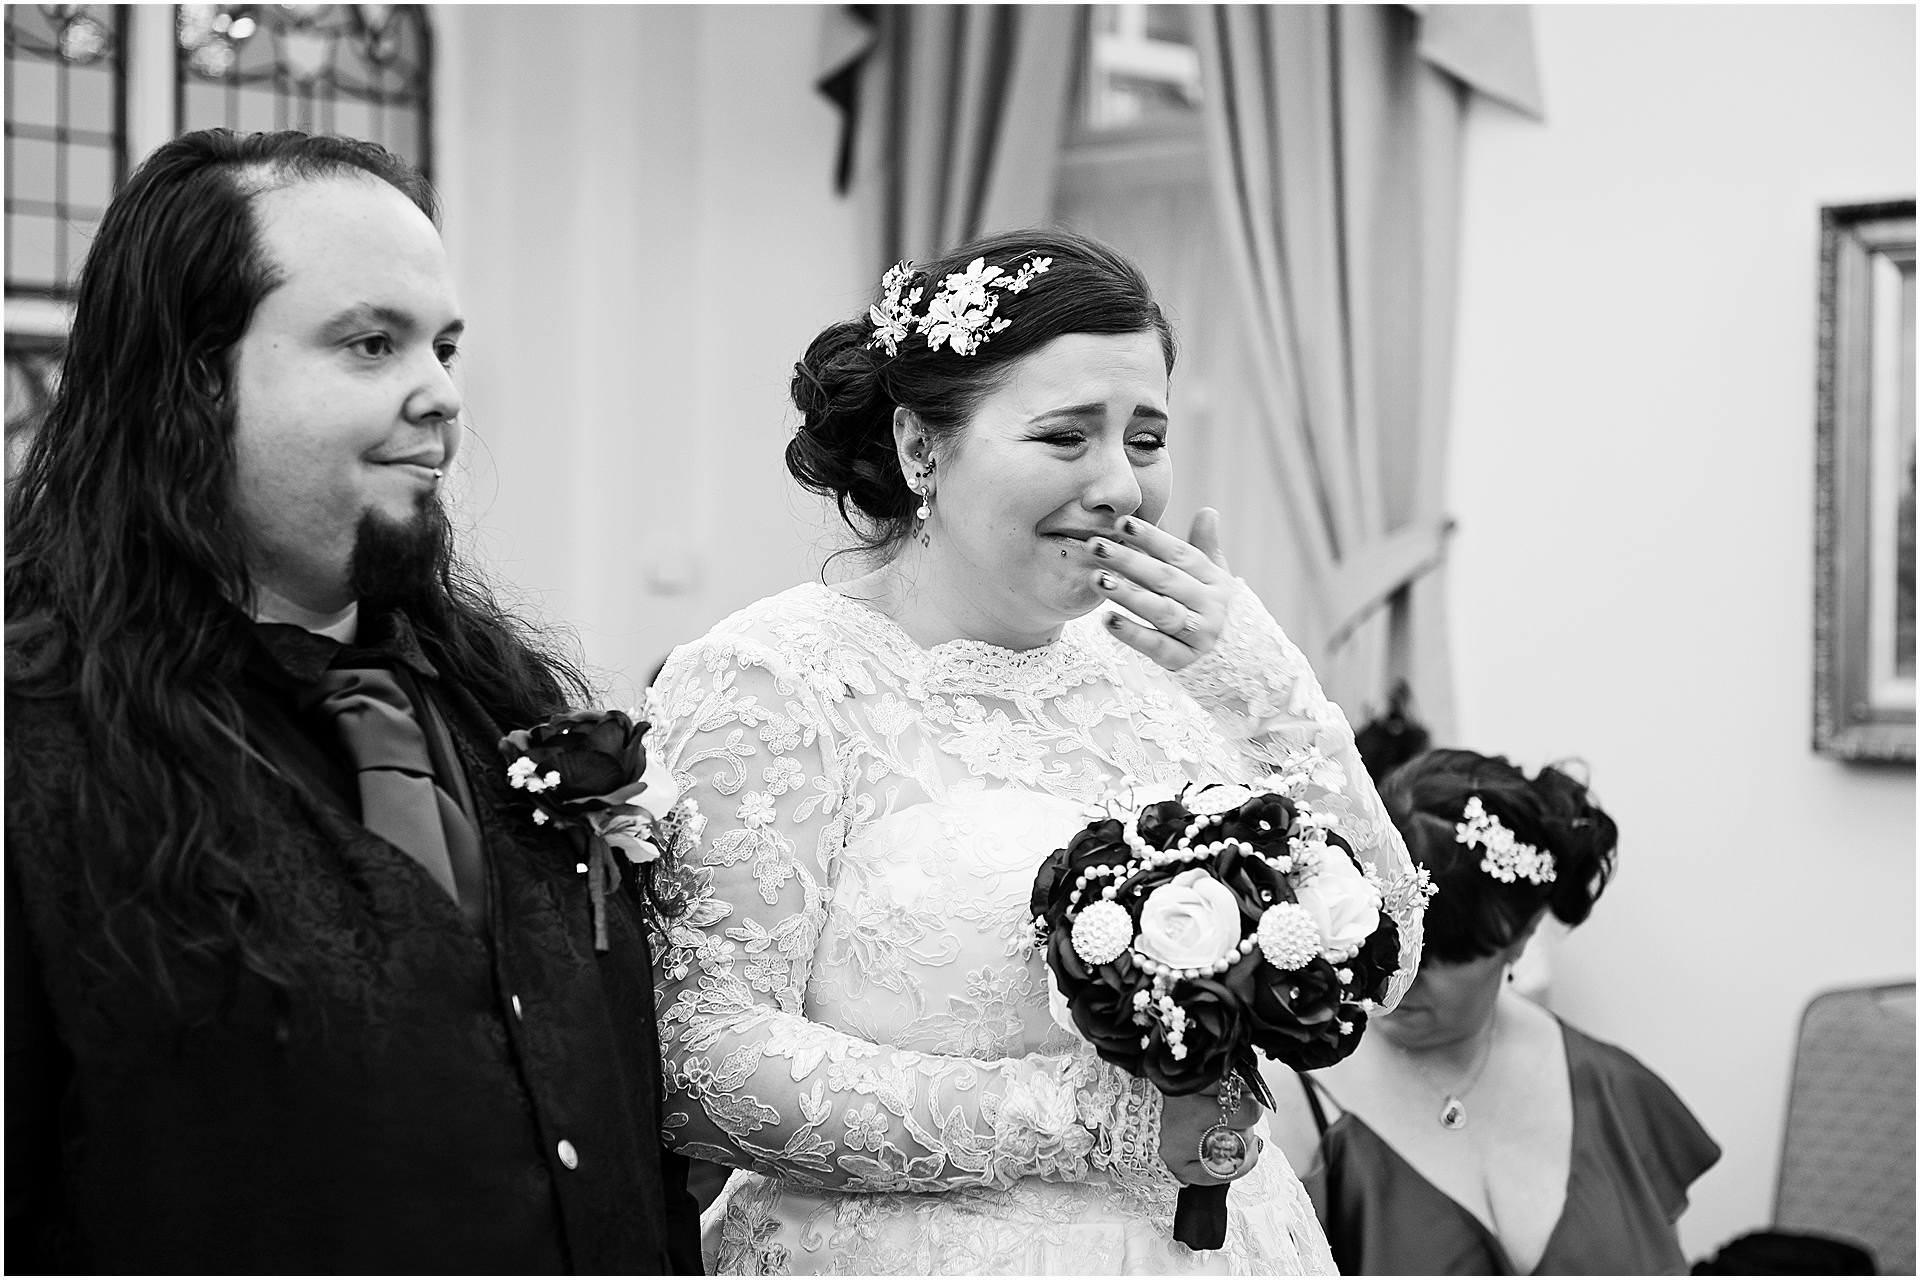 wedding_photography at dukinfield_townhall with sarah_bee_photography dukinfield_park dukinfeild_cheshire_2001.jpg